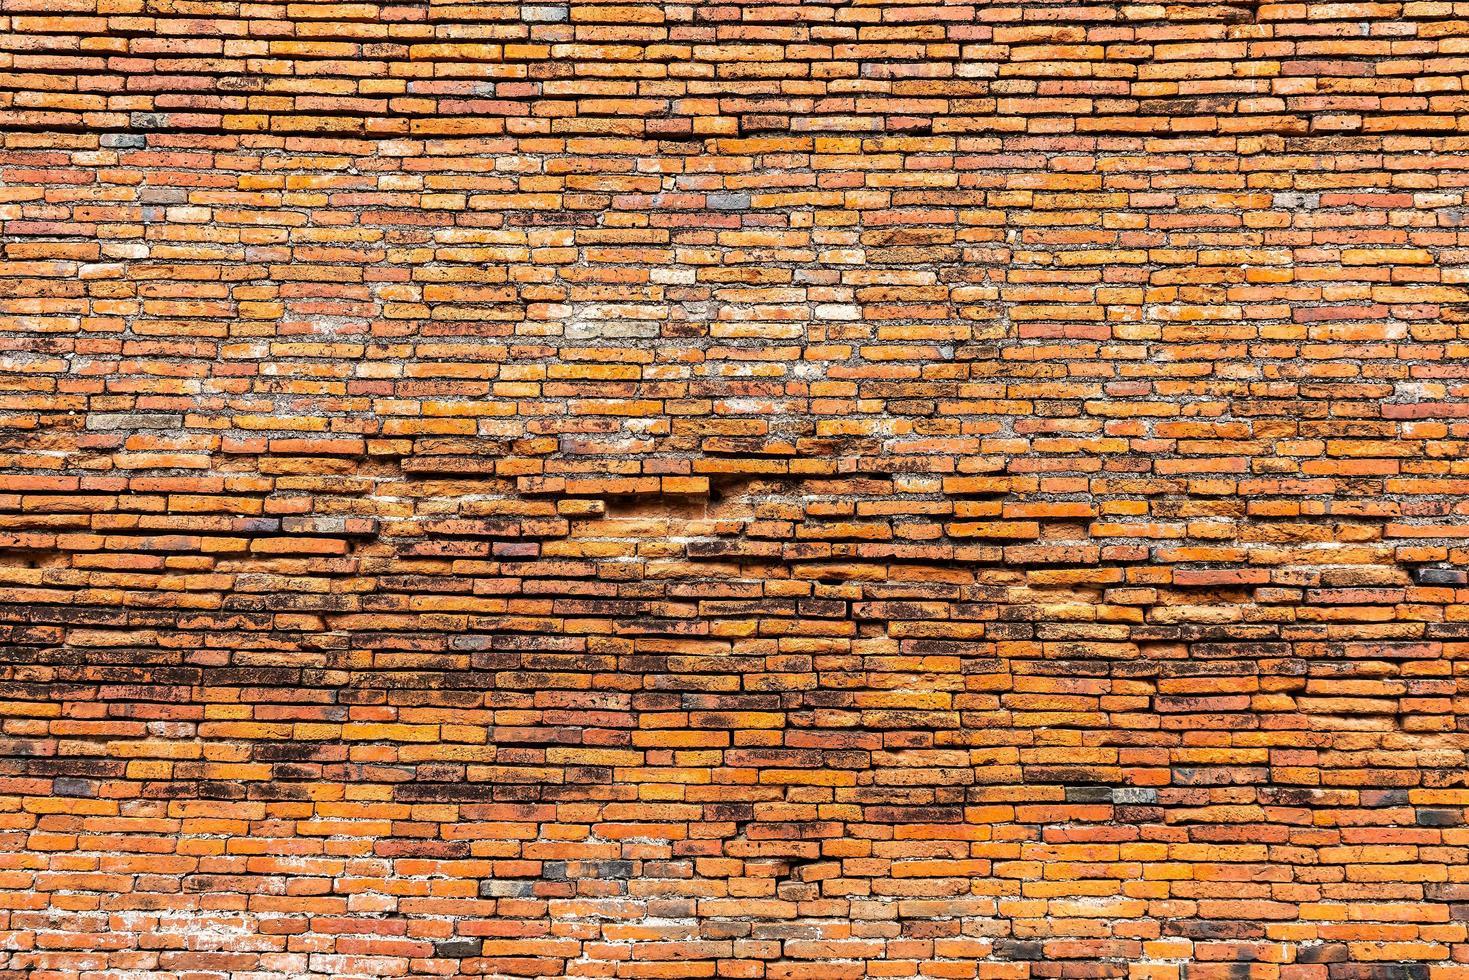 bakstenen muur textuur foto